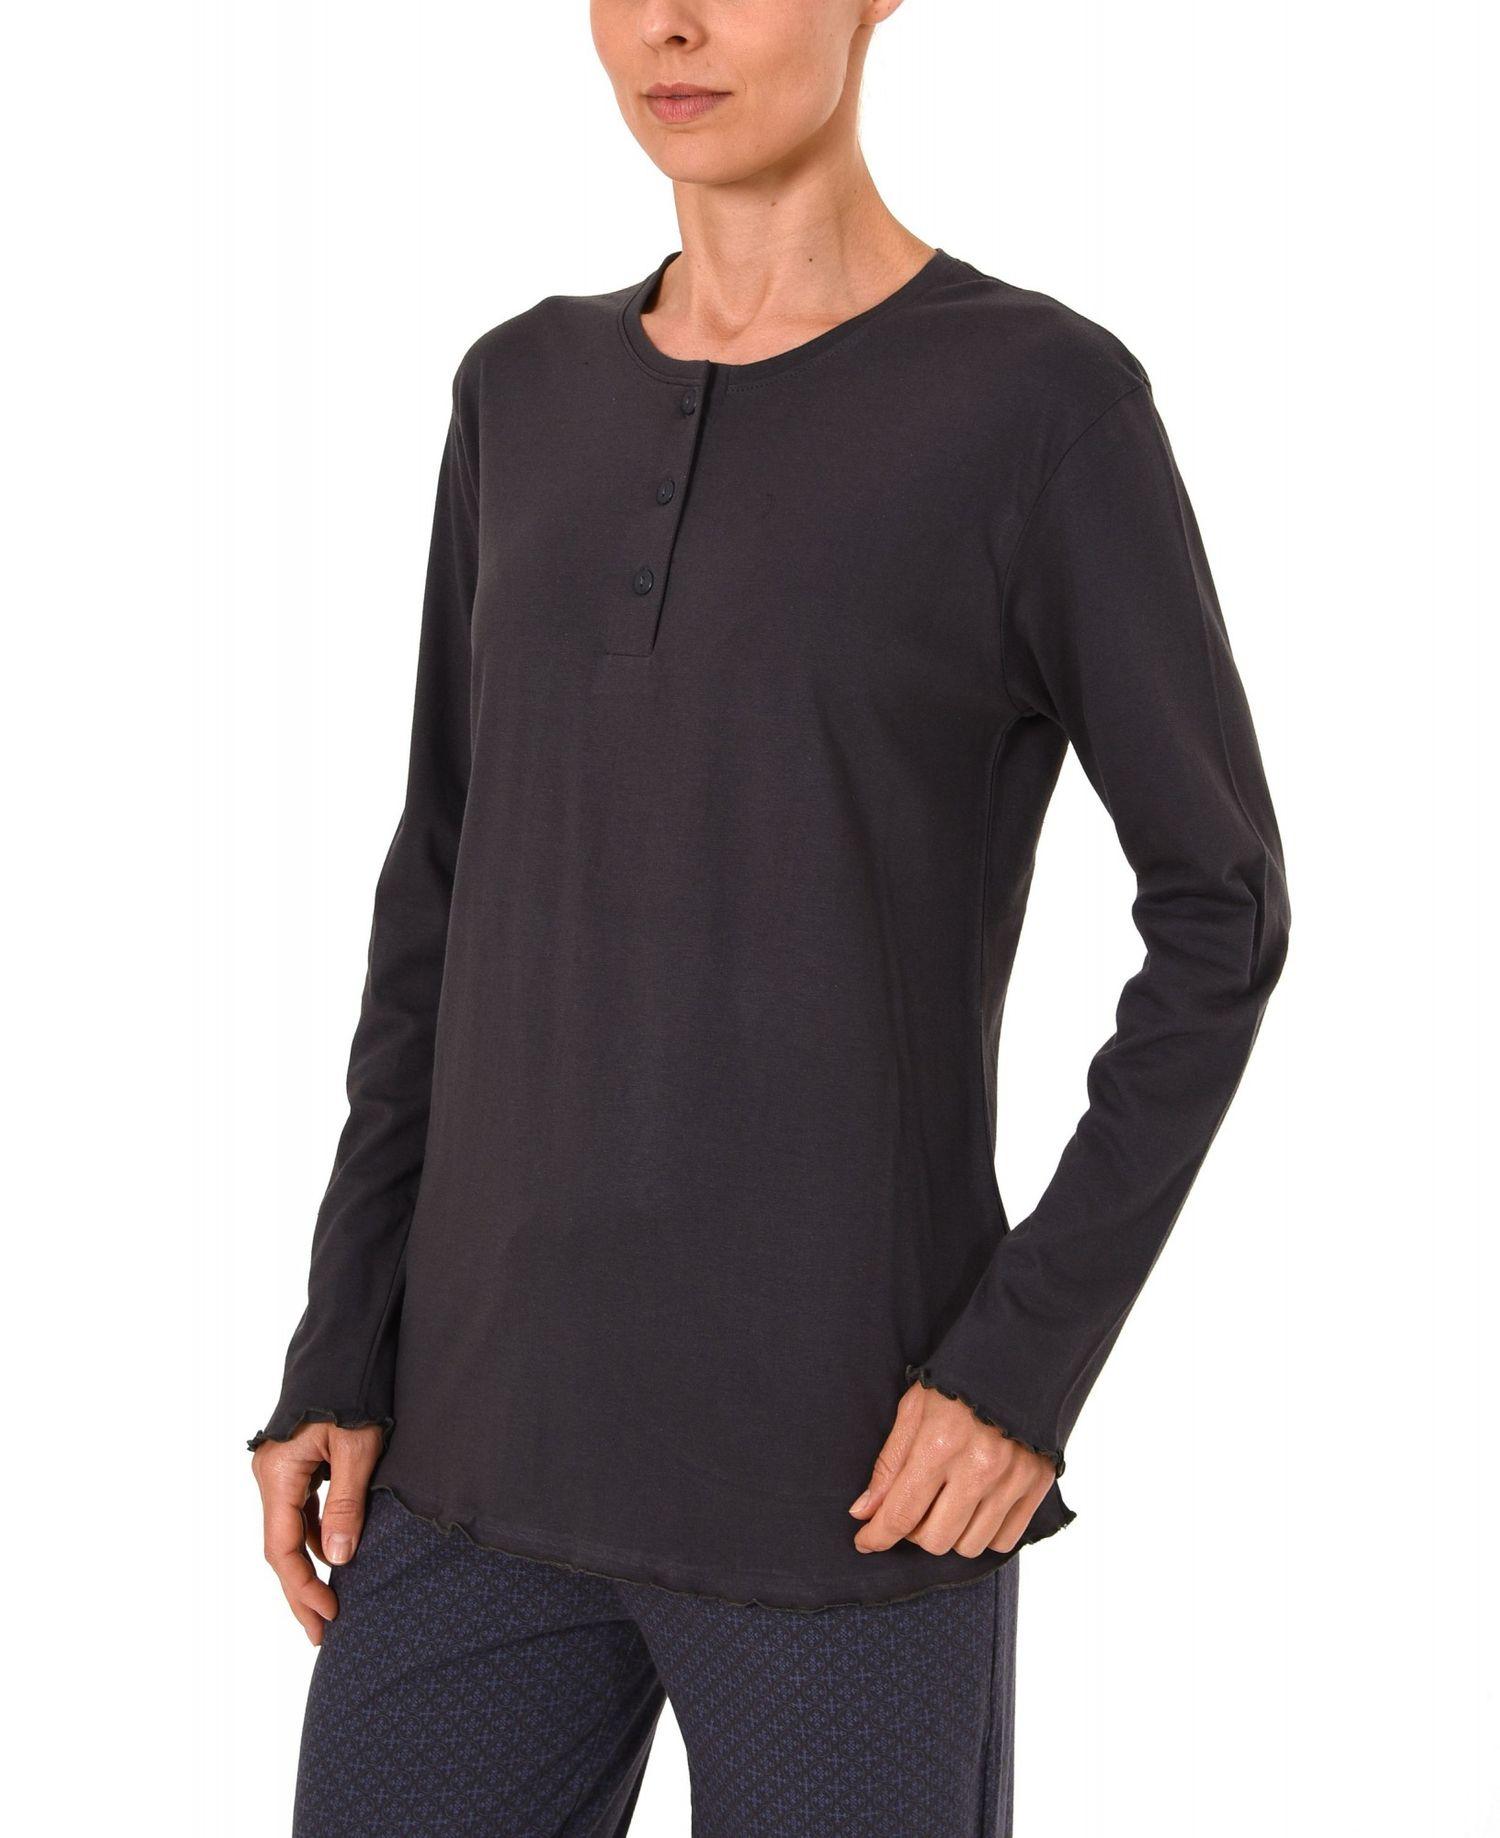 Damen Shirt - Oberteil langarm Mix & Match blau, grau oder beere – 271 219 90 102 – Bild 3